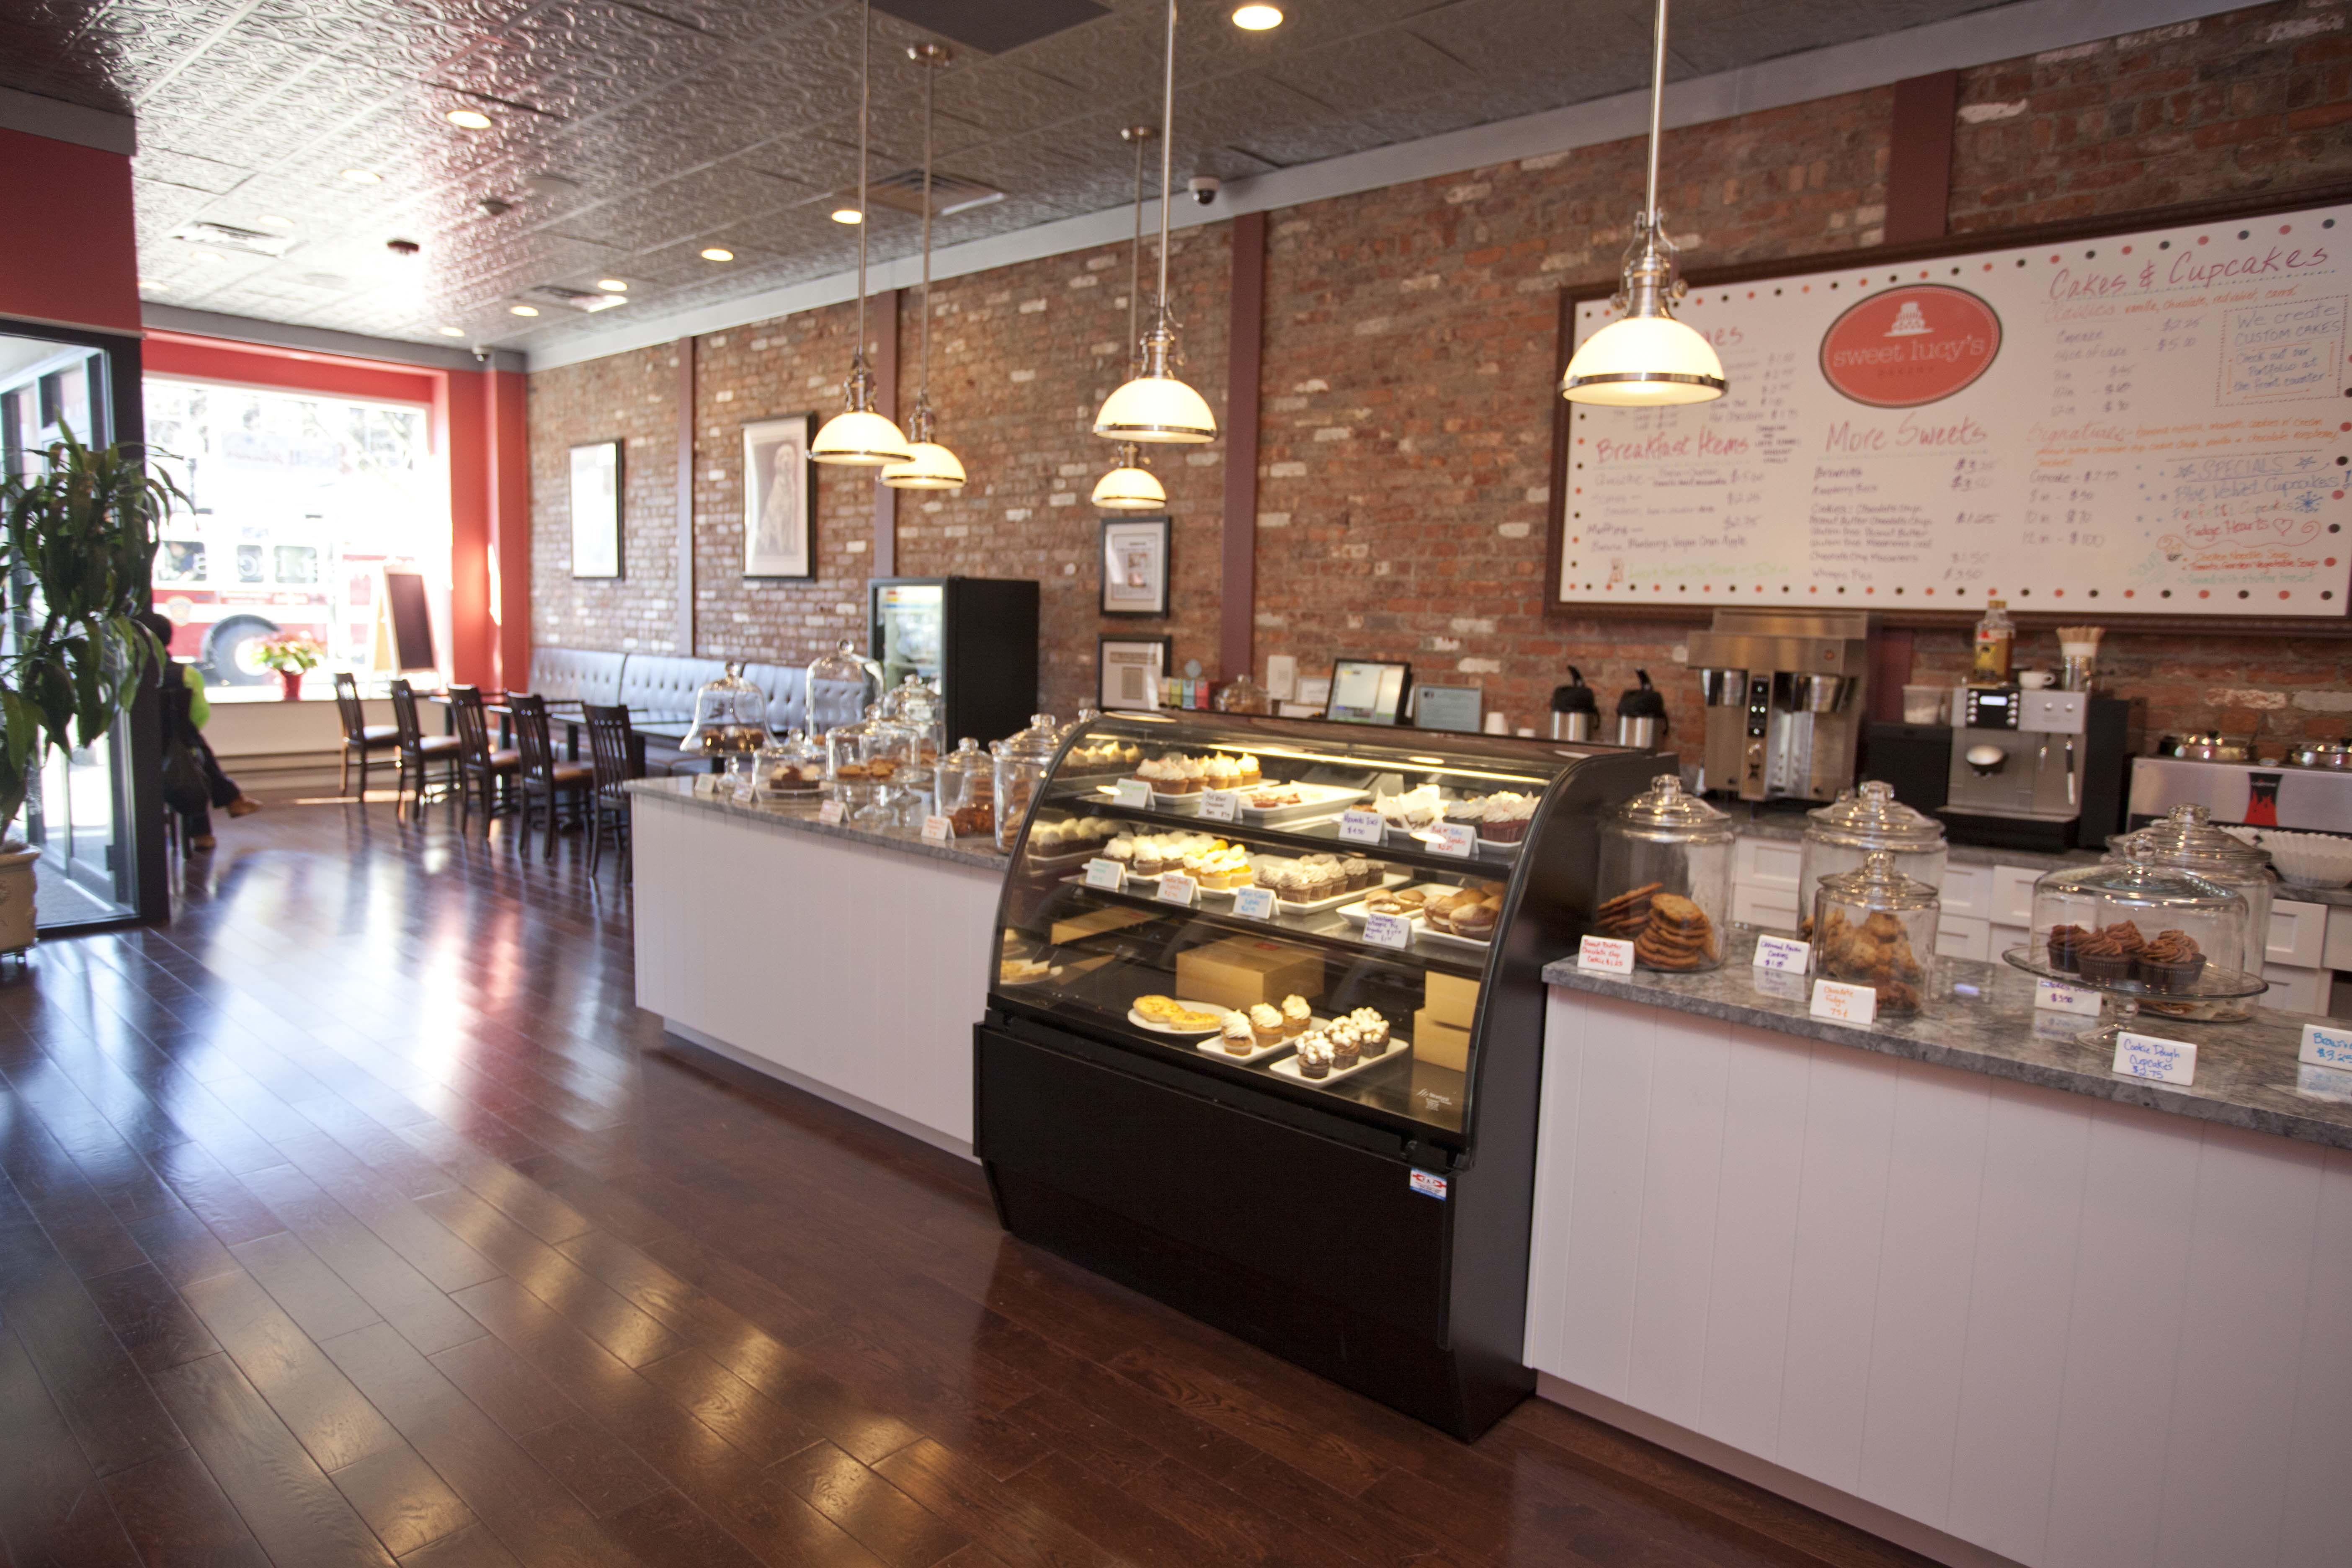 Has A Similar Brick Background Cafe Morristown Breakfast Bar